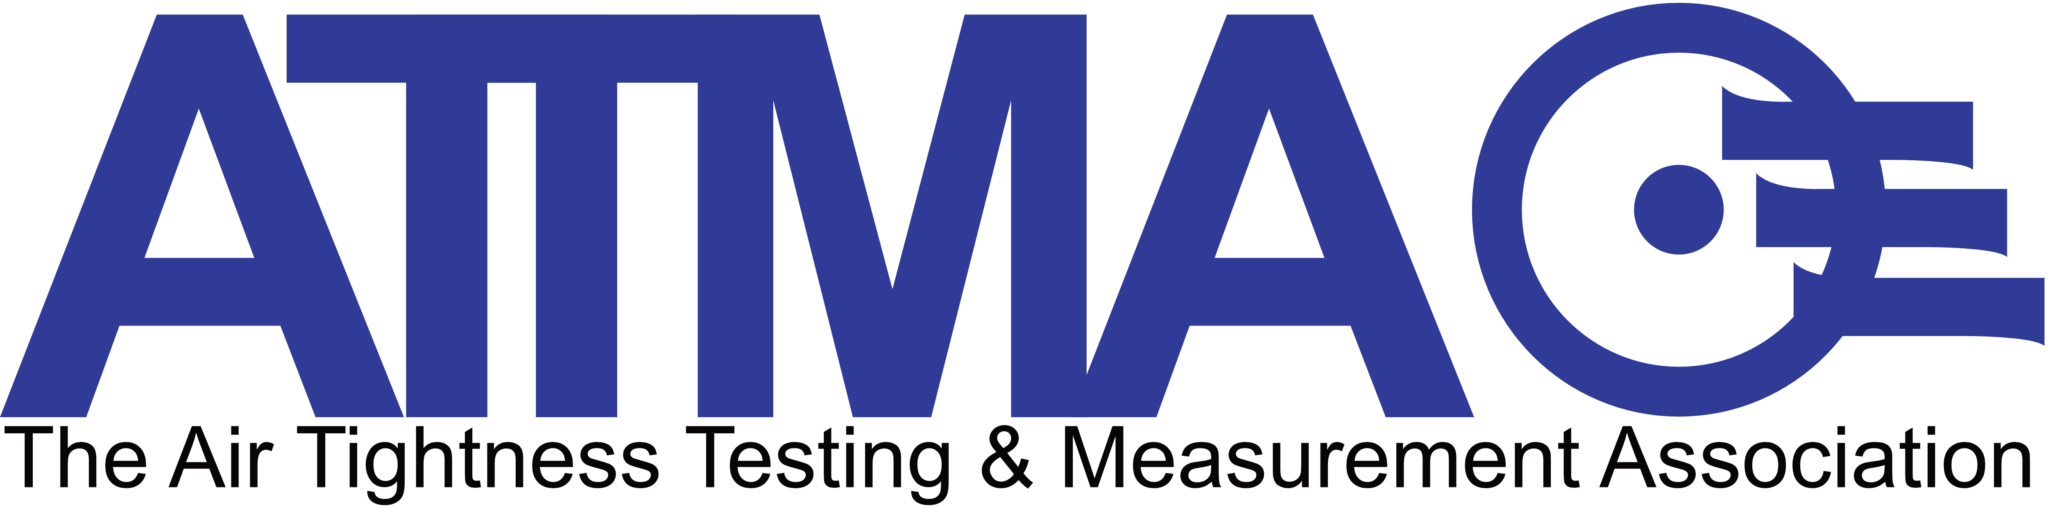 ATTMA Logo